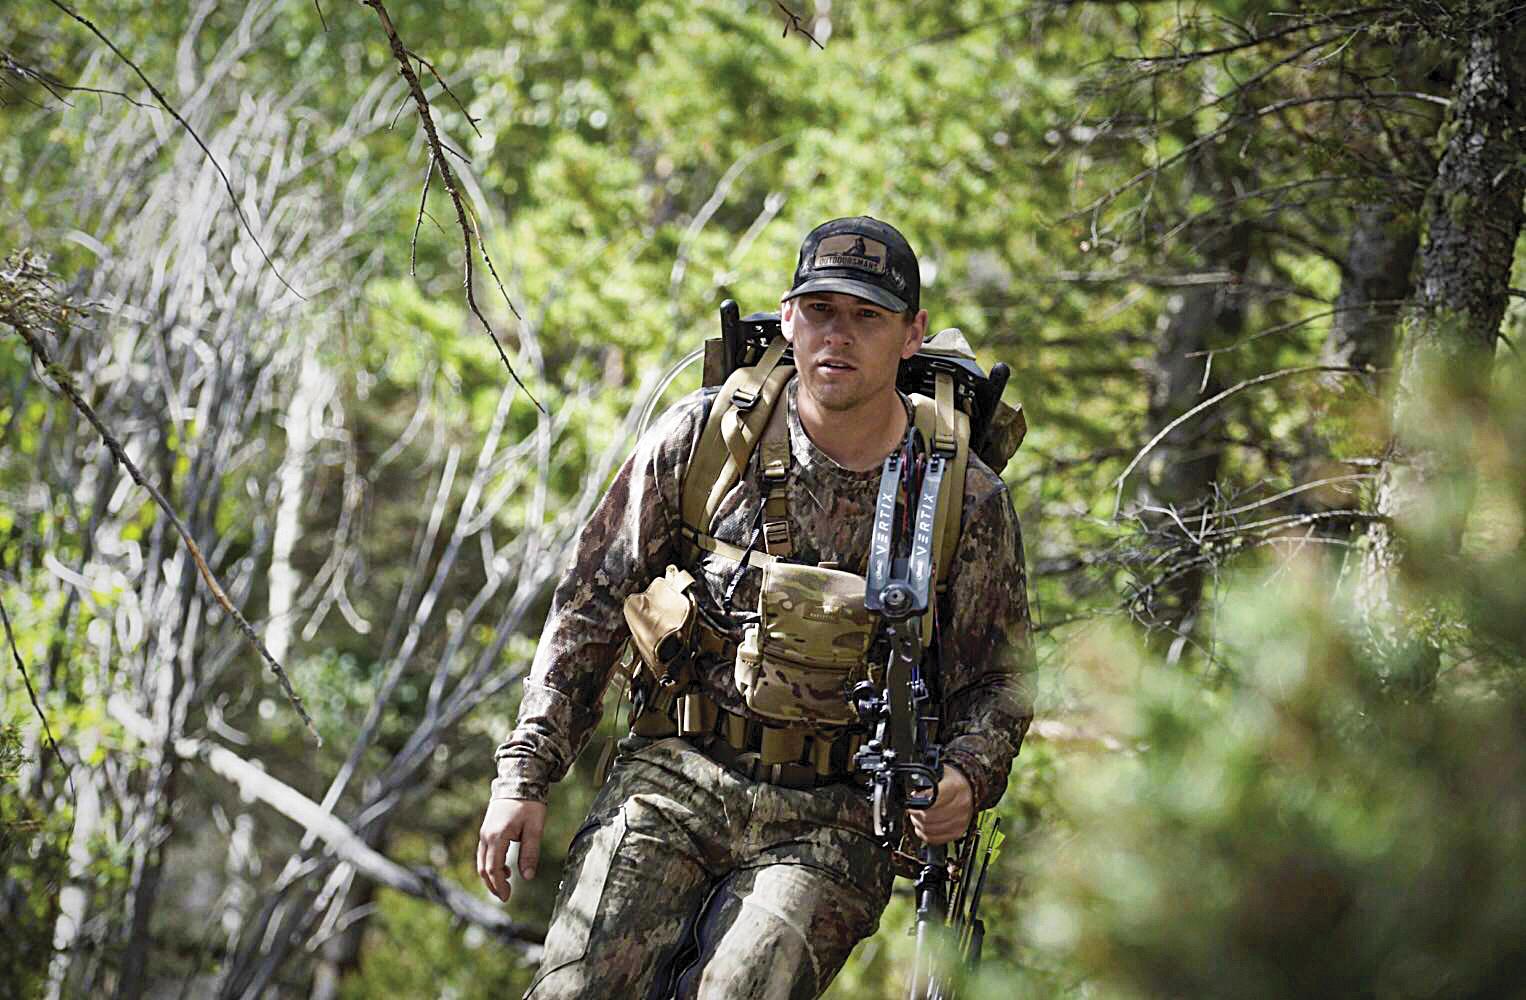 Mark Denham archery hunting.